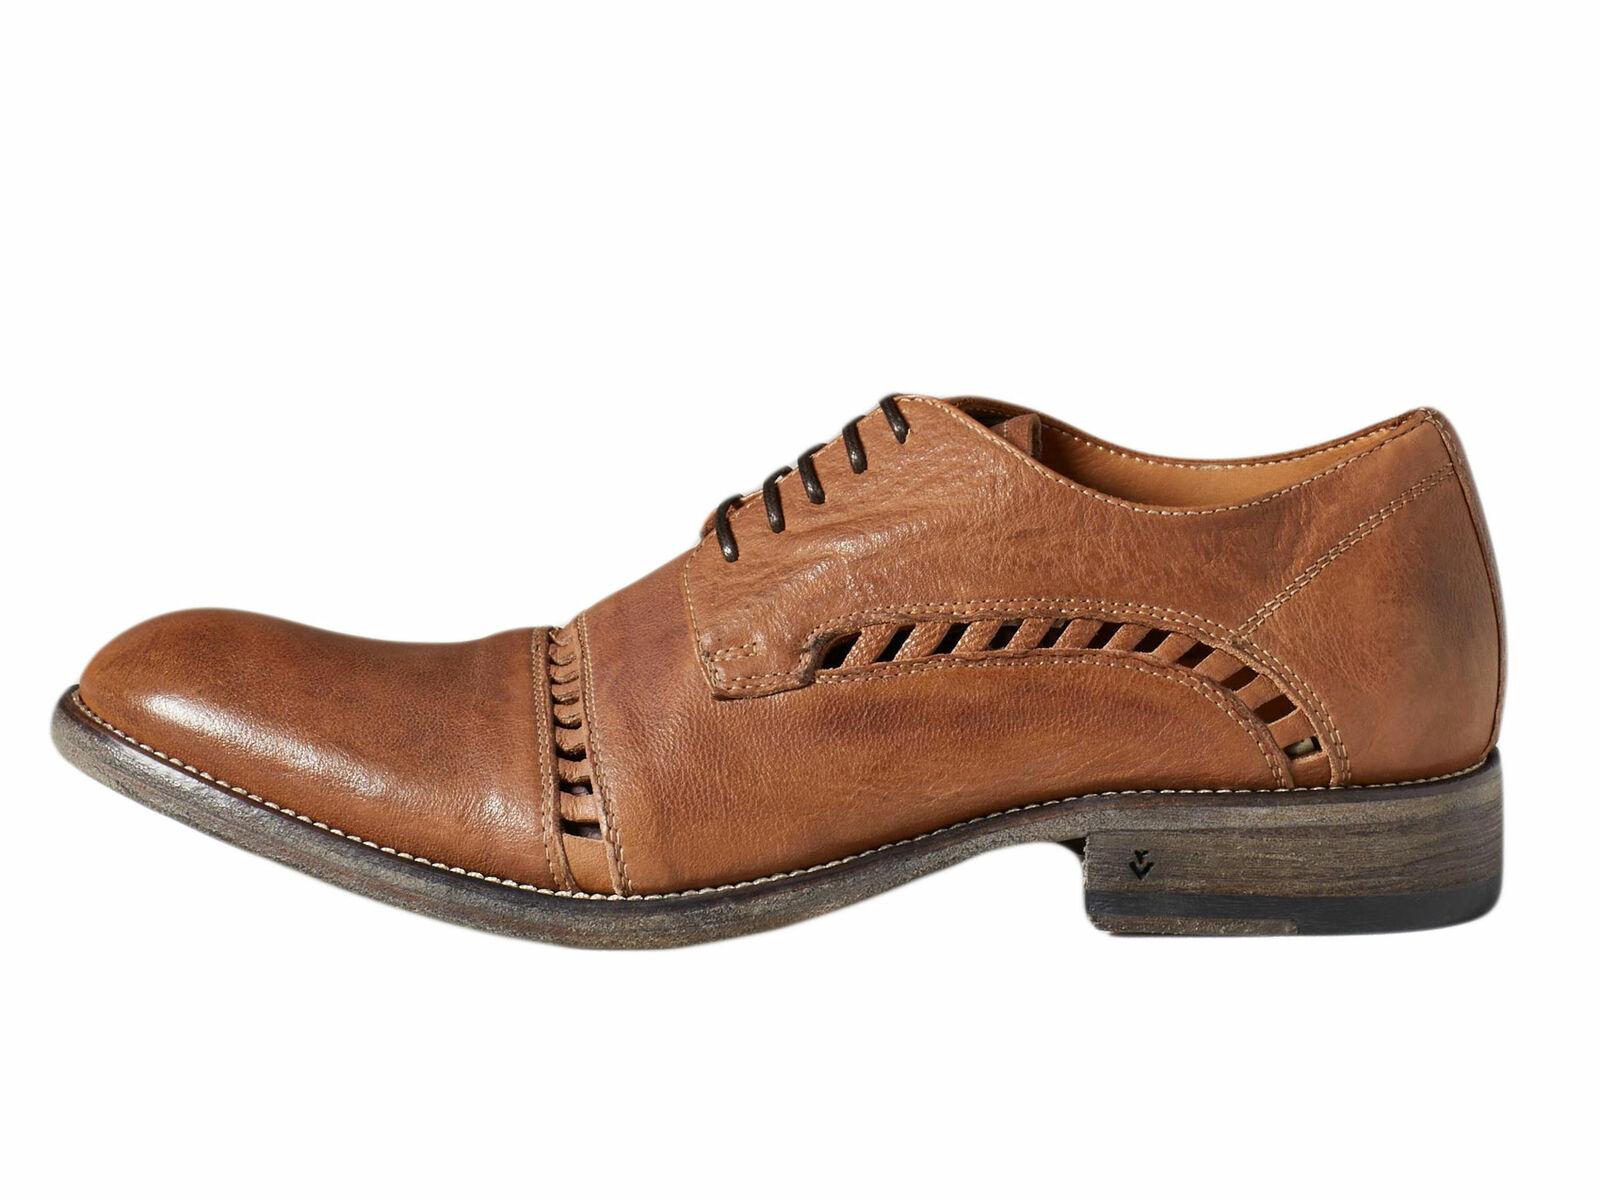 Business Schuhe Herren Leder Schuhe Blockabsatz Oxford